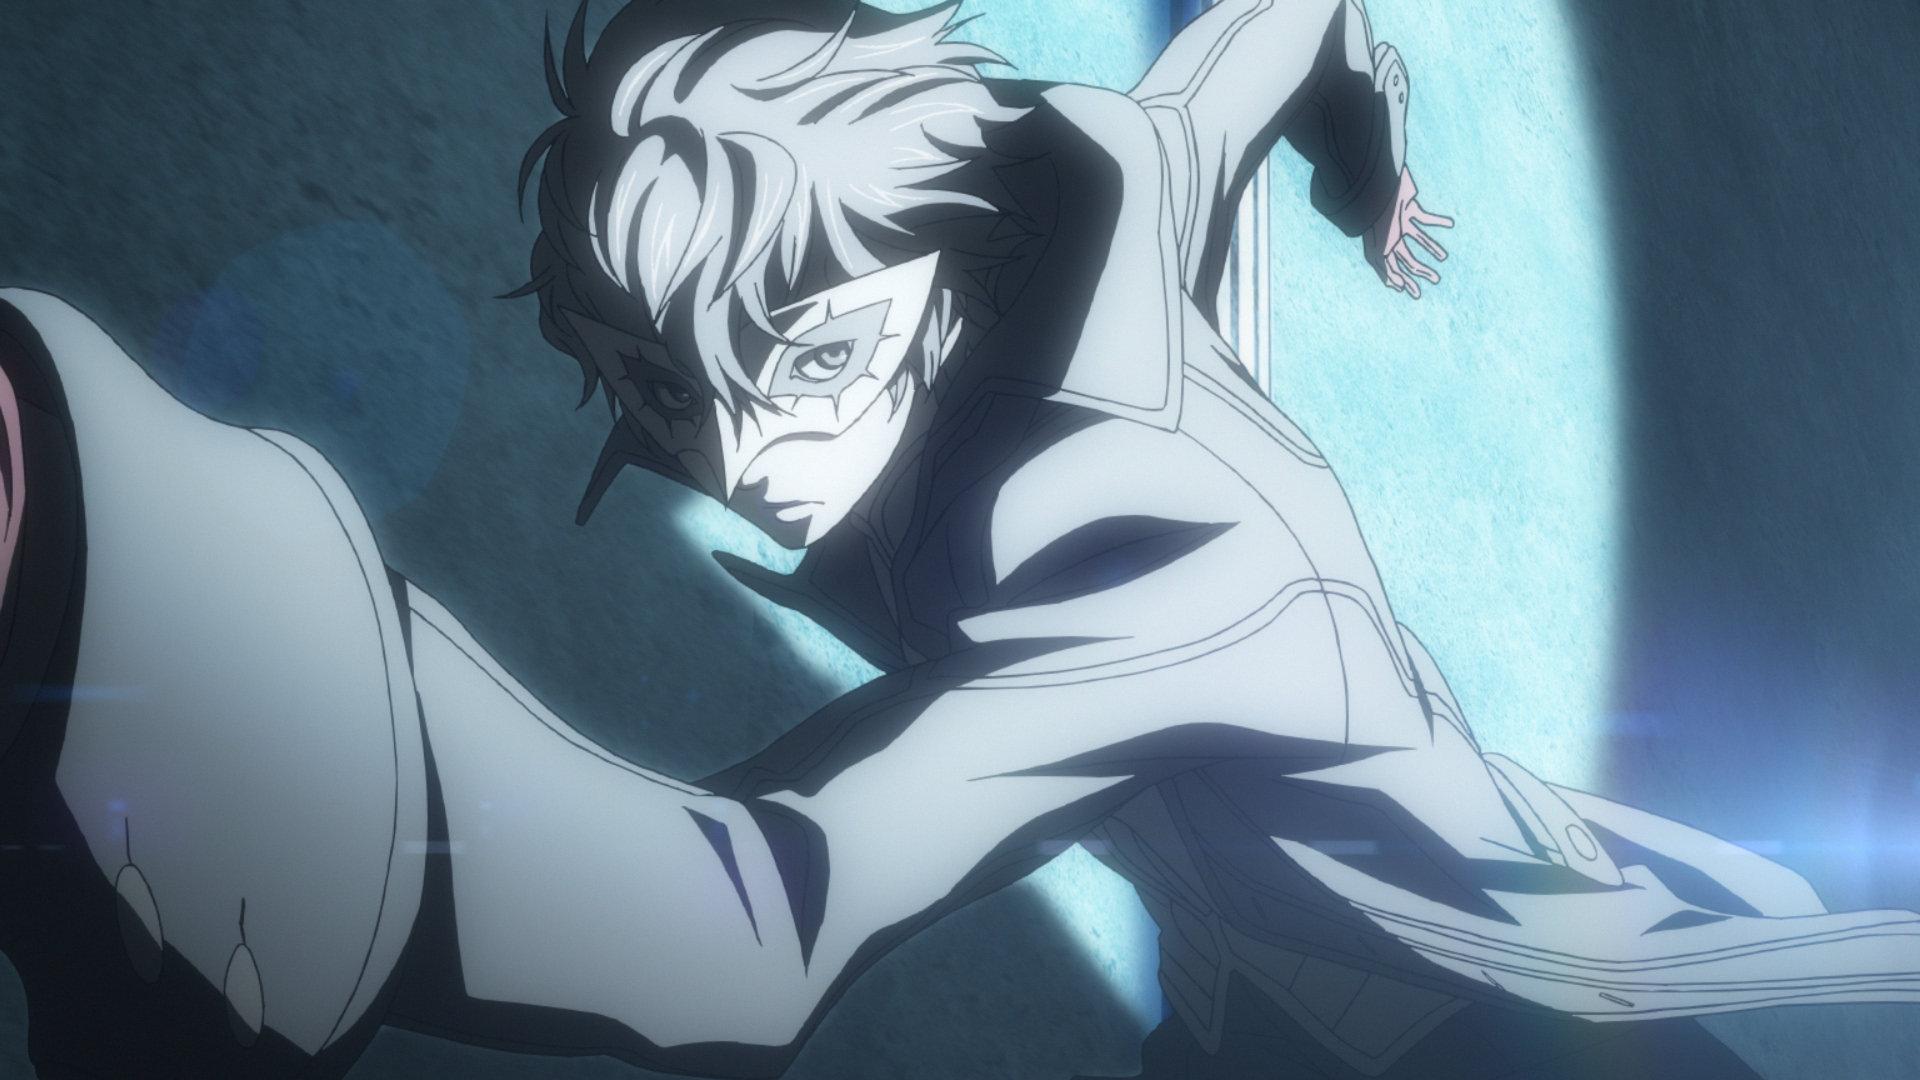 Screenshot of Joker from Persona 5